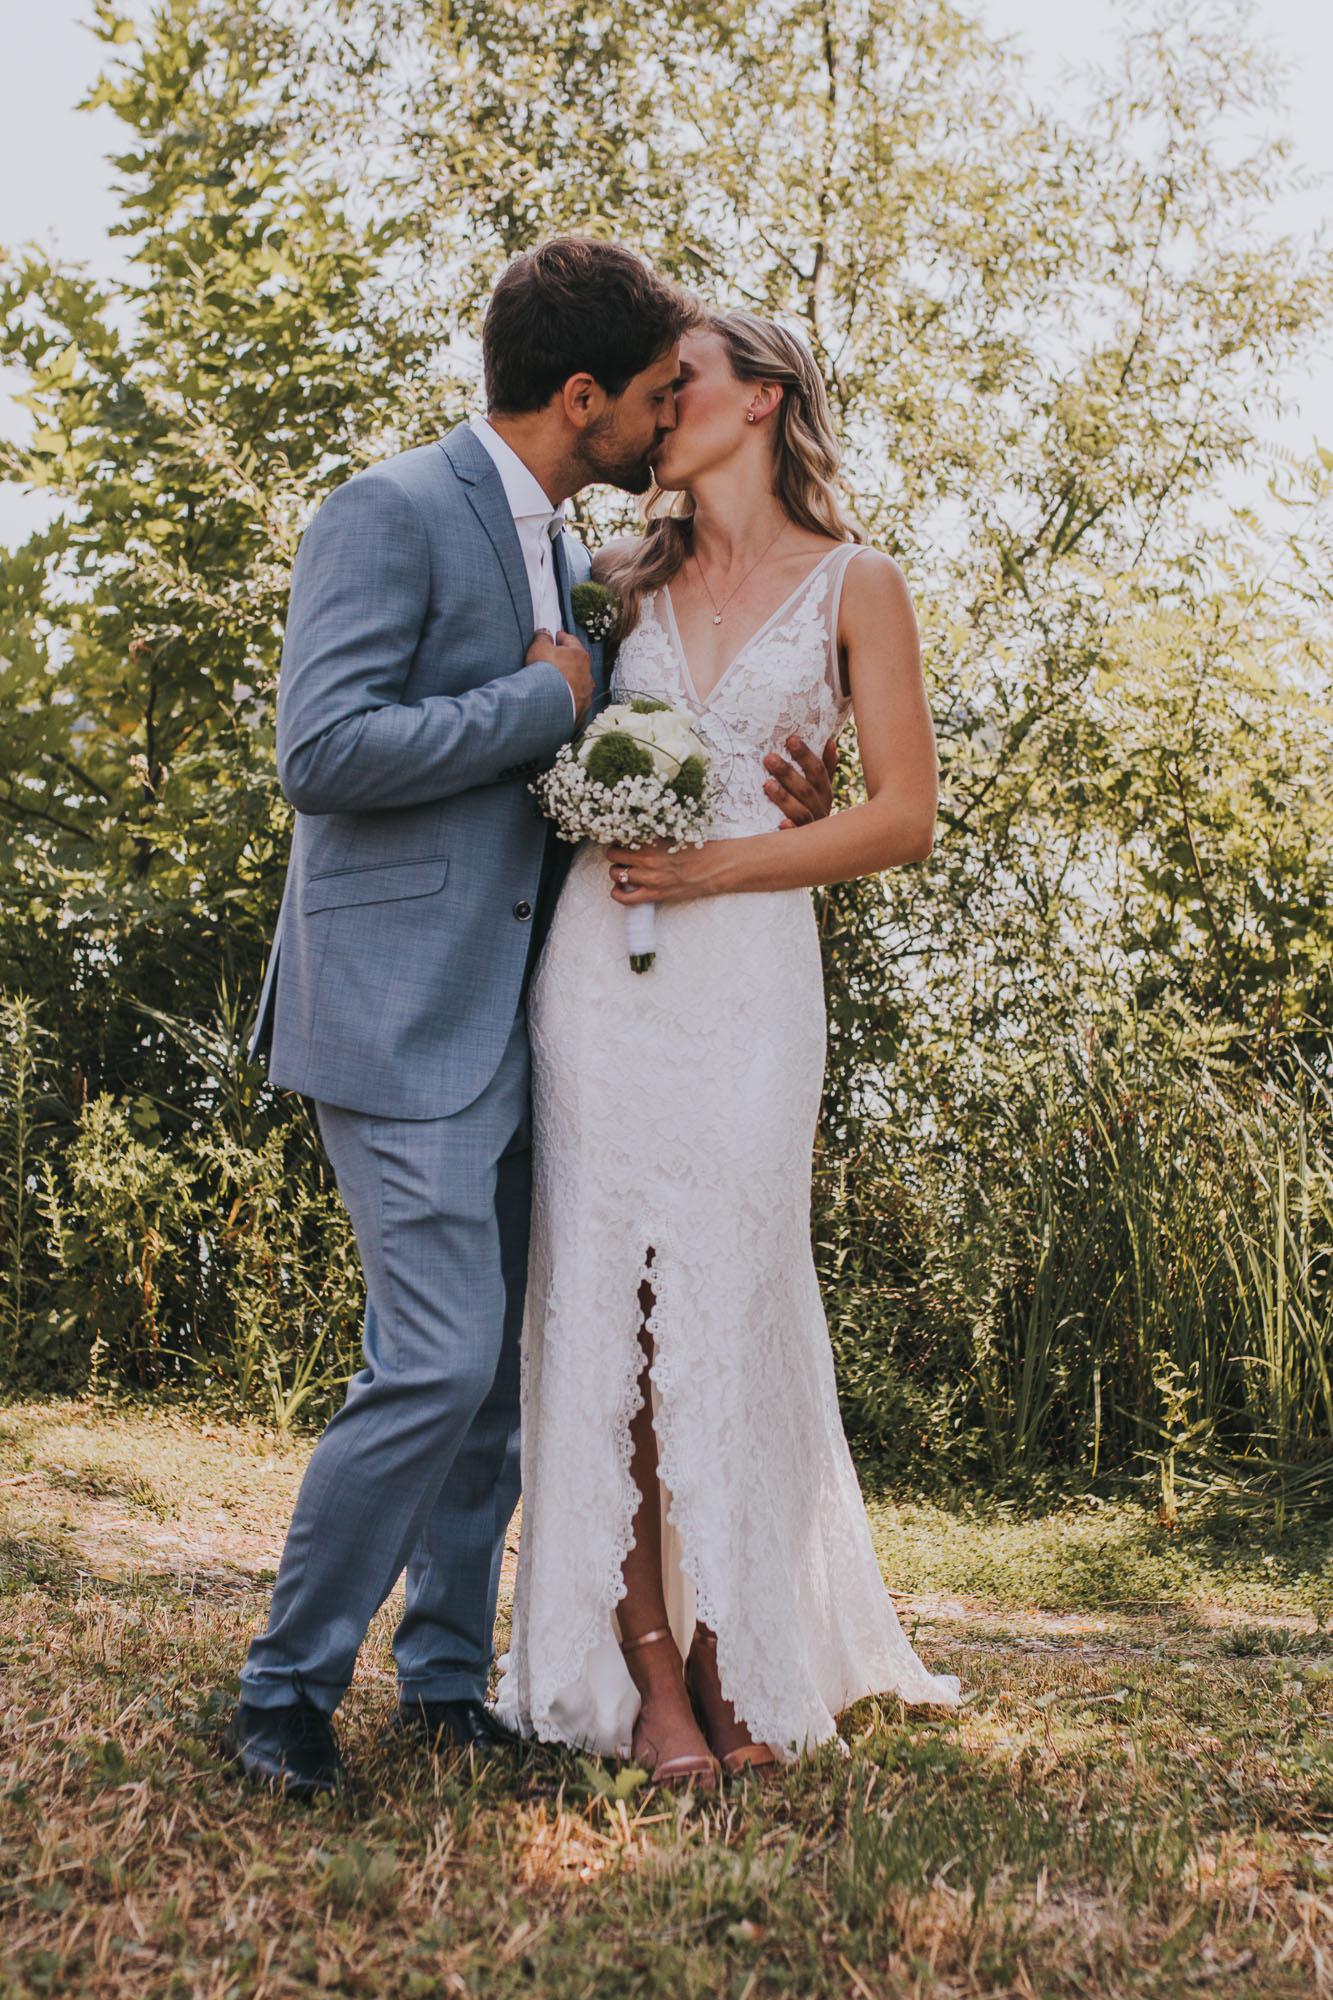 20180720-Memoryfactory-Sara&Jacopo-23- Hochzeit.jpg